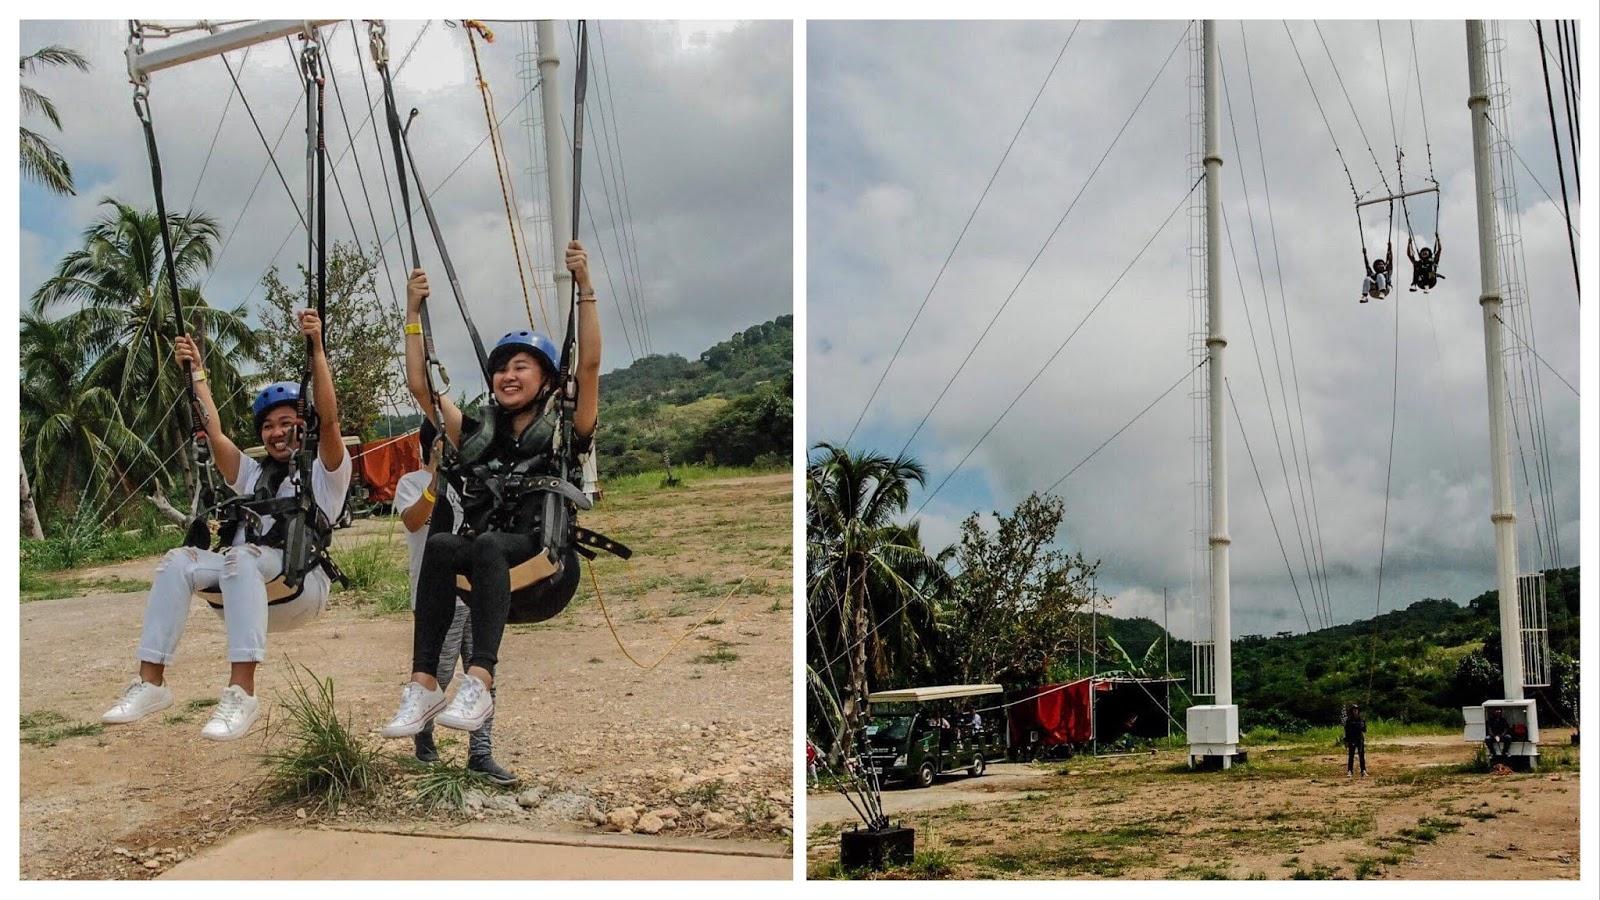 Cebu Safari Adventure Rides Giant Swing